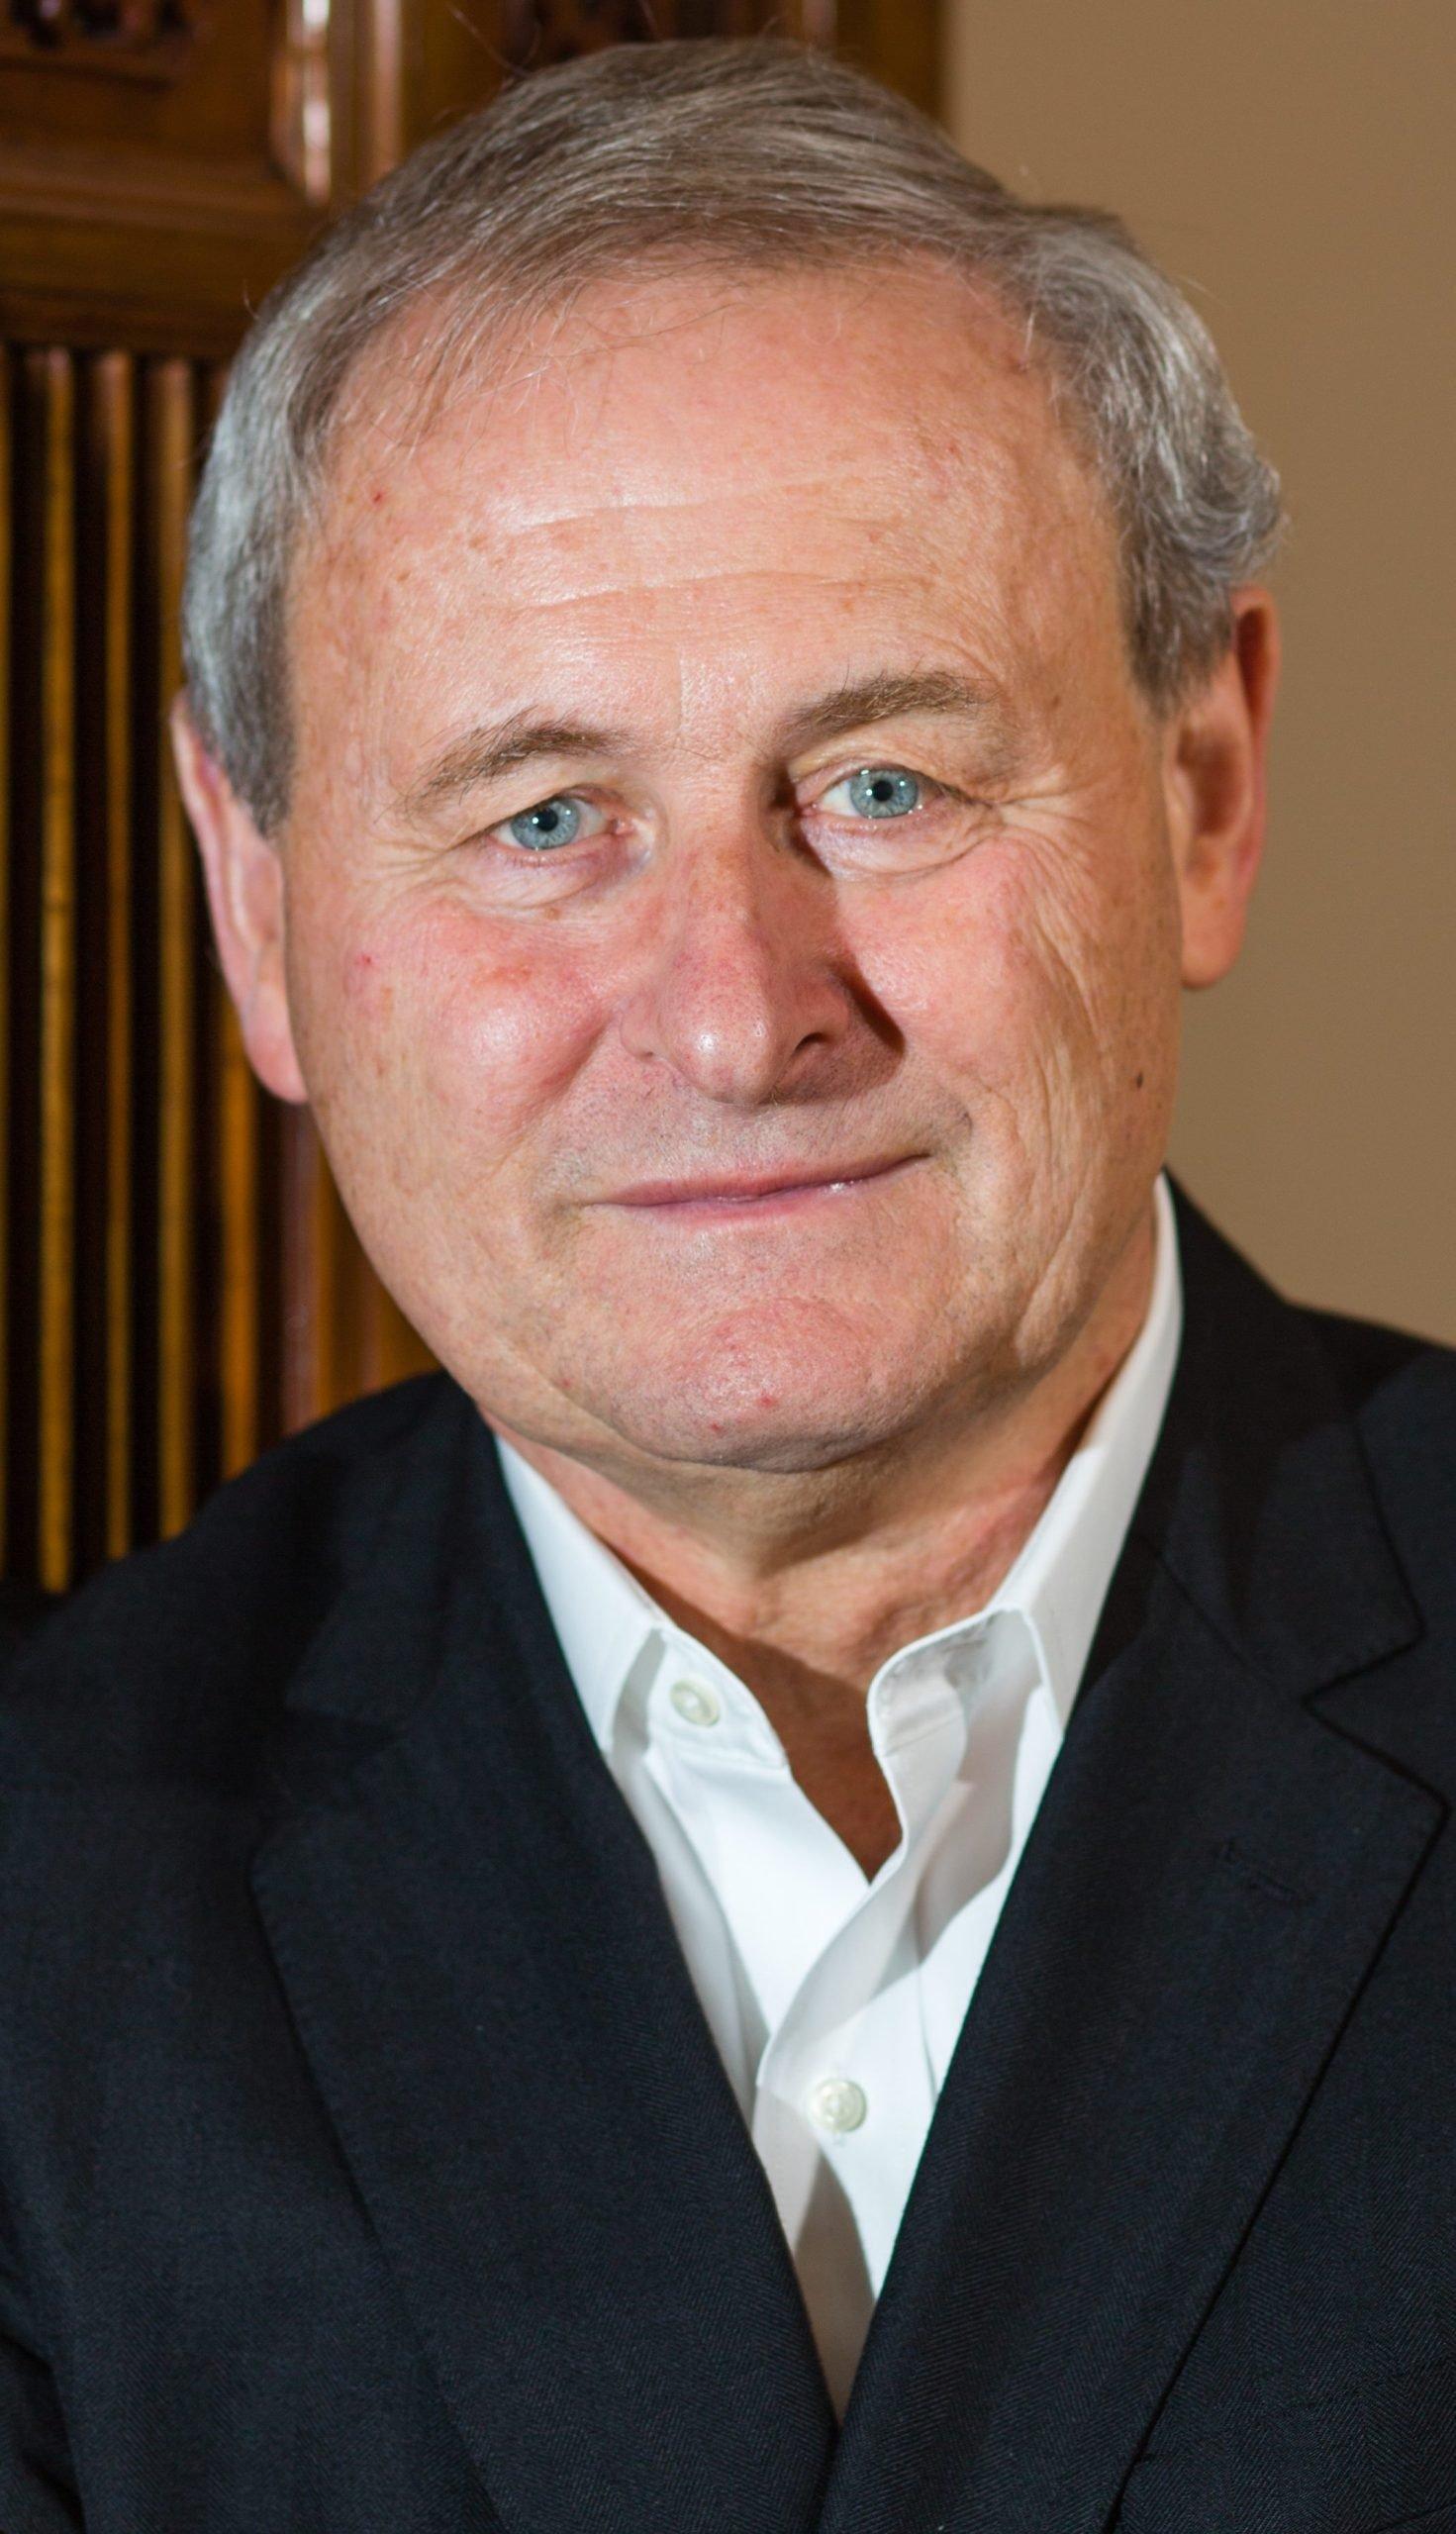 Clint Laurent